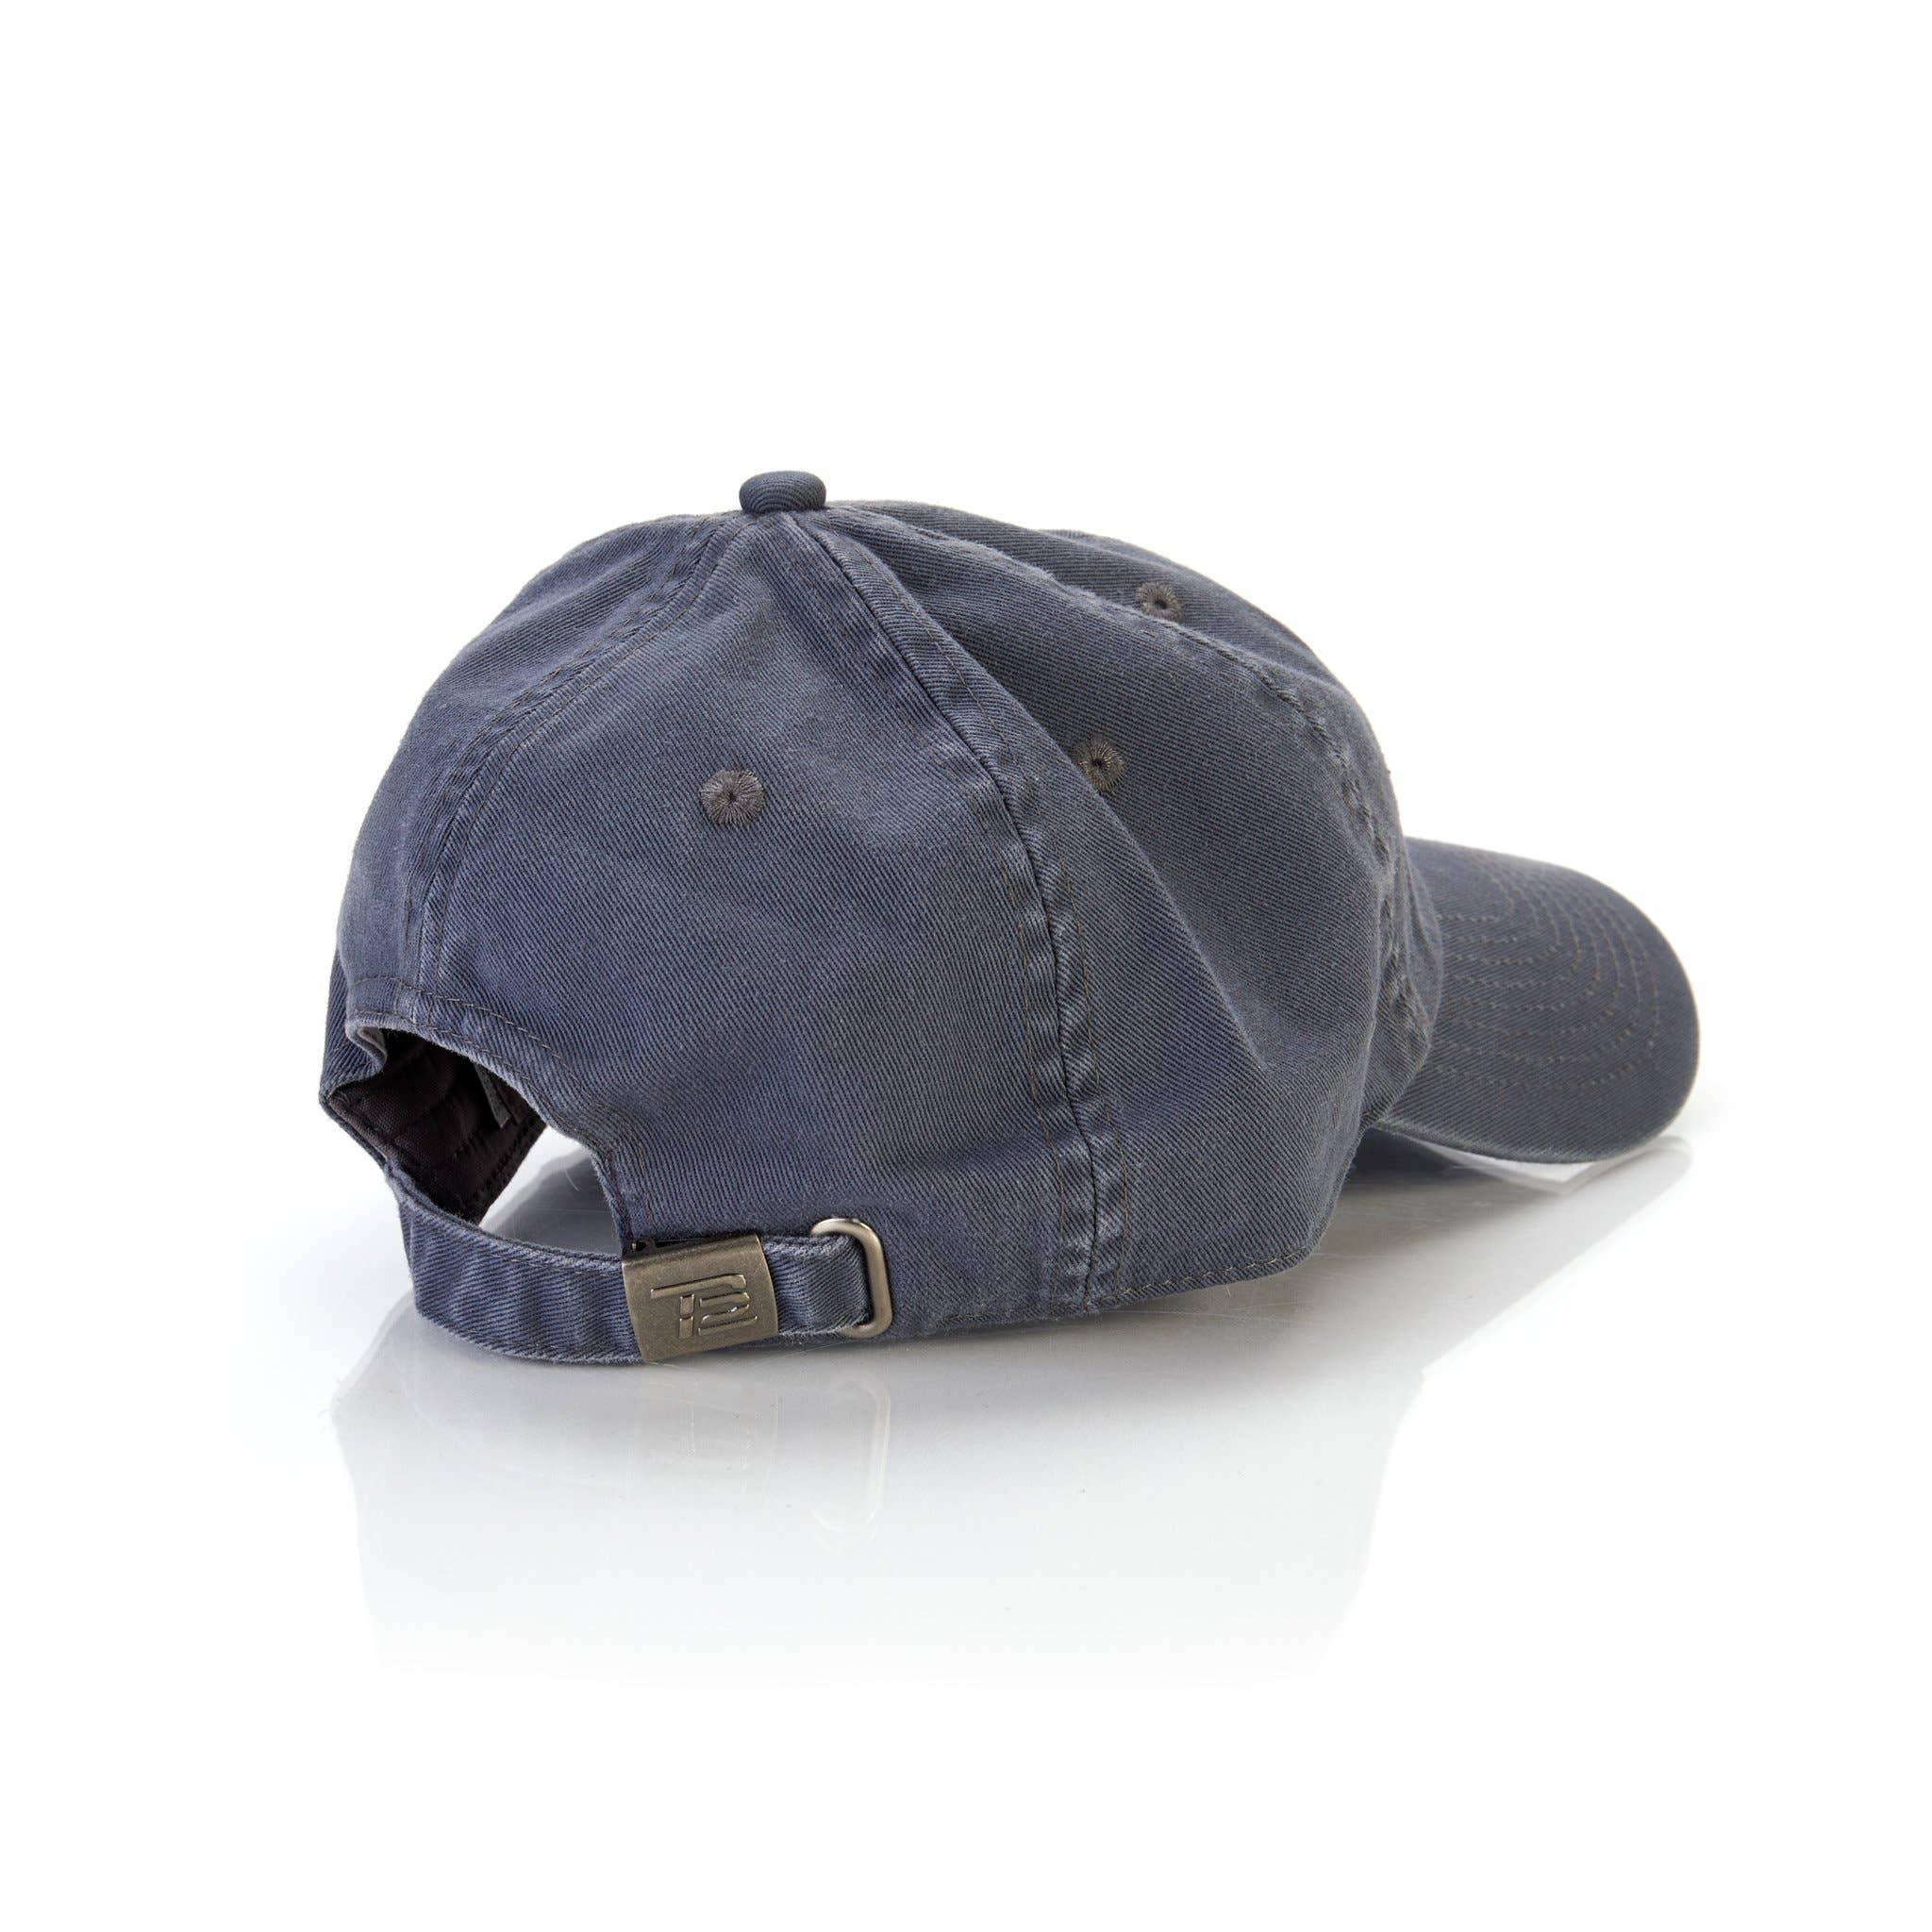 TB12™ Adjustable Caps